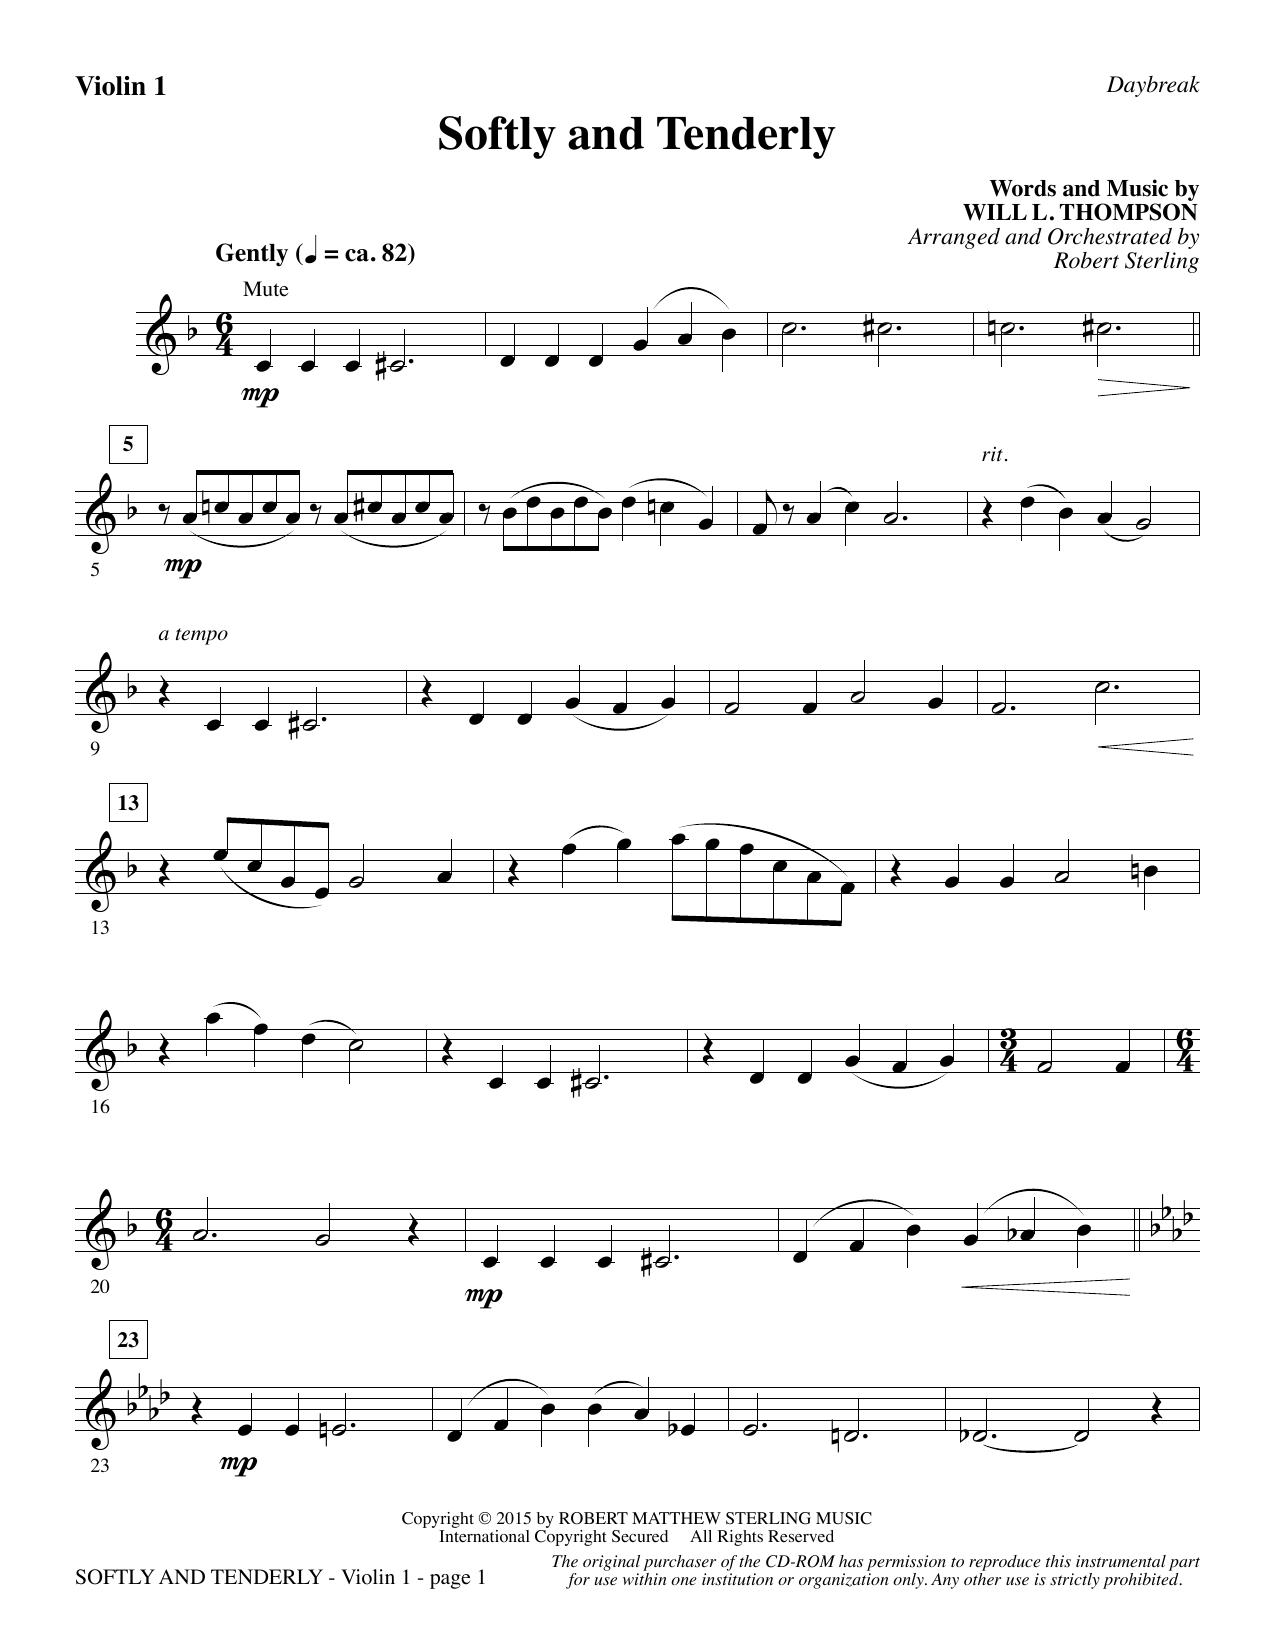 Softly and Tenderly - Violin 1 Sheet Music